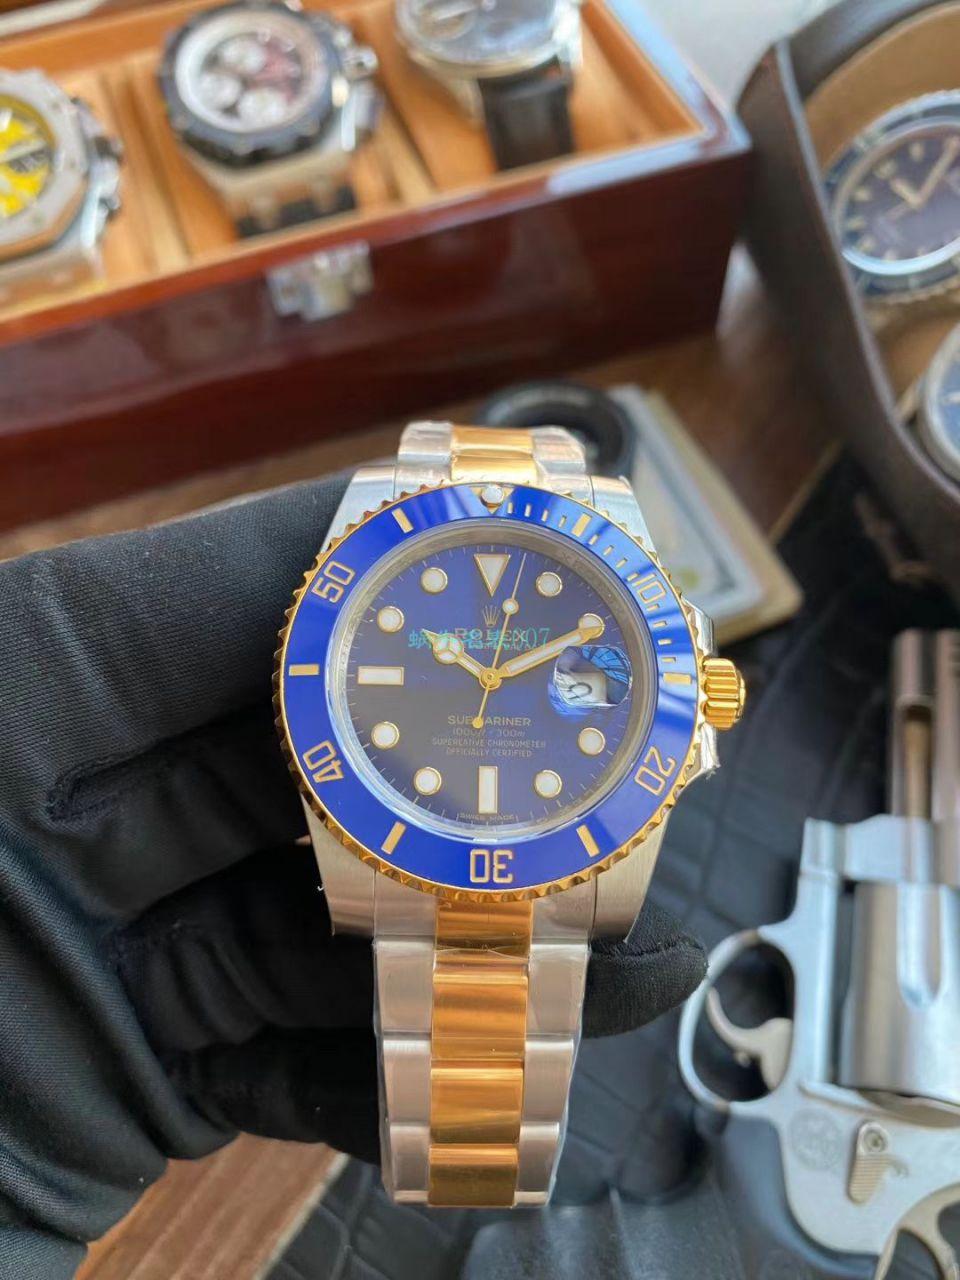 VR厂劳力士复刻包金手表潜航者型间金蓝水鬼116613LB-97203 蓝盘腕表